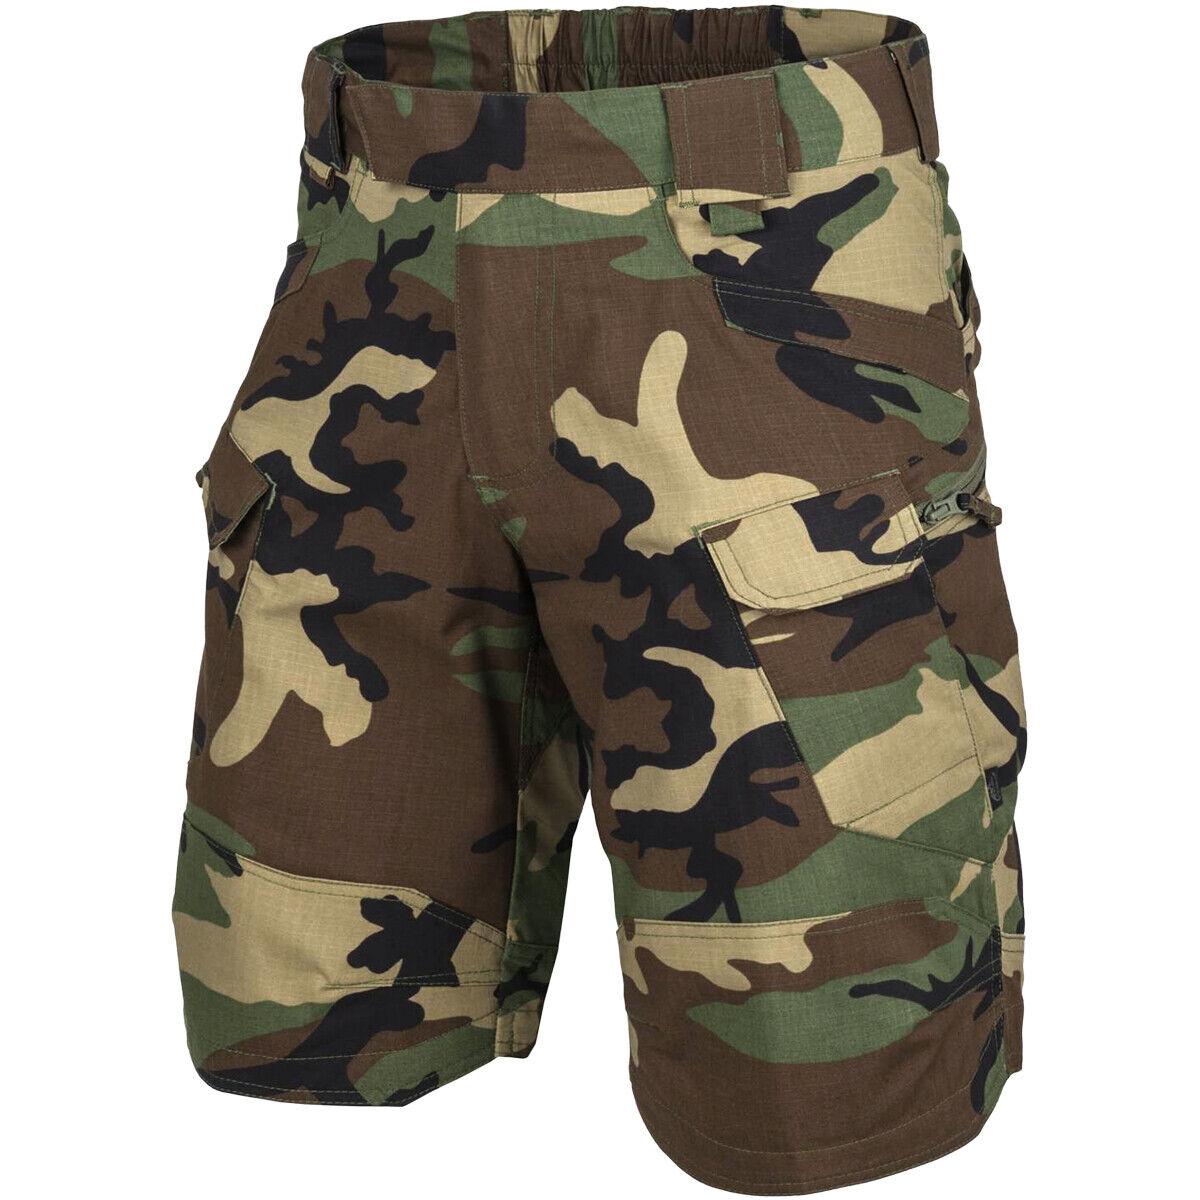 Coyote Braun Polycotton Ripstop Helikon-Tex Urban Tactical Shorts/® 11 S